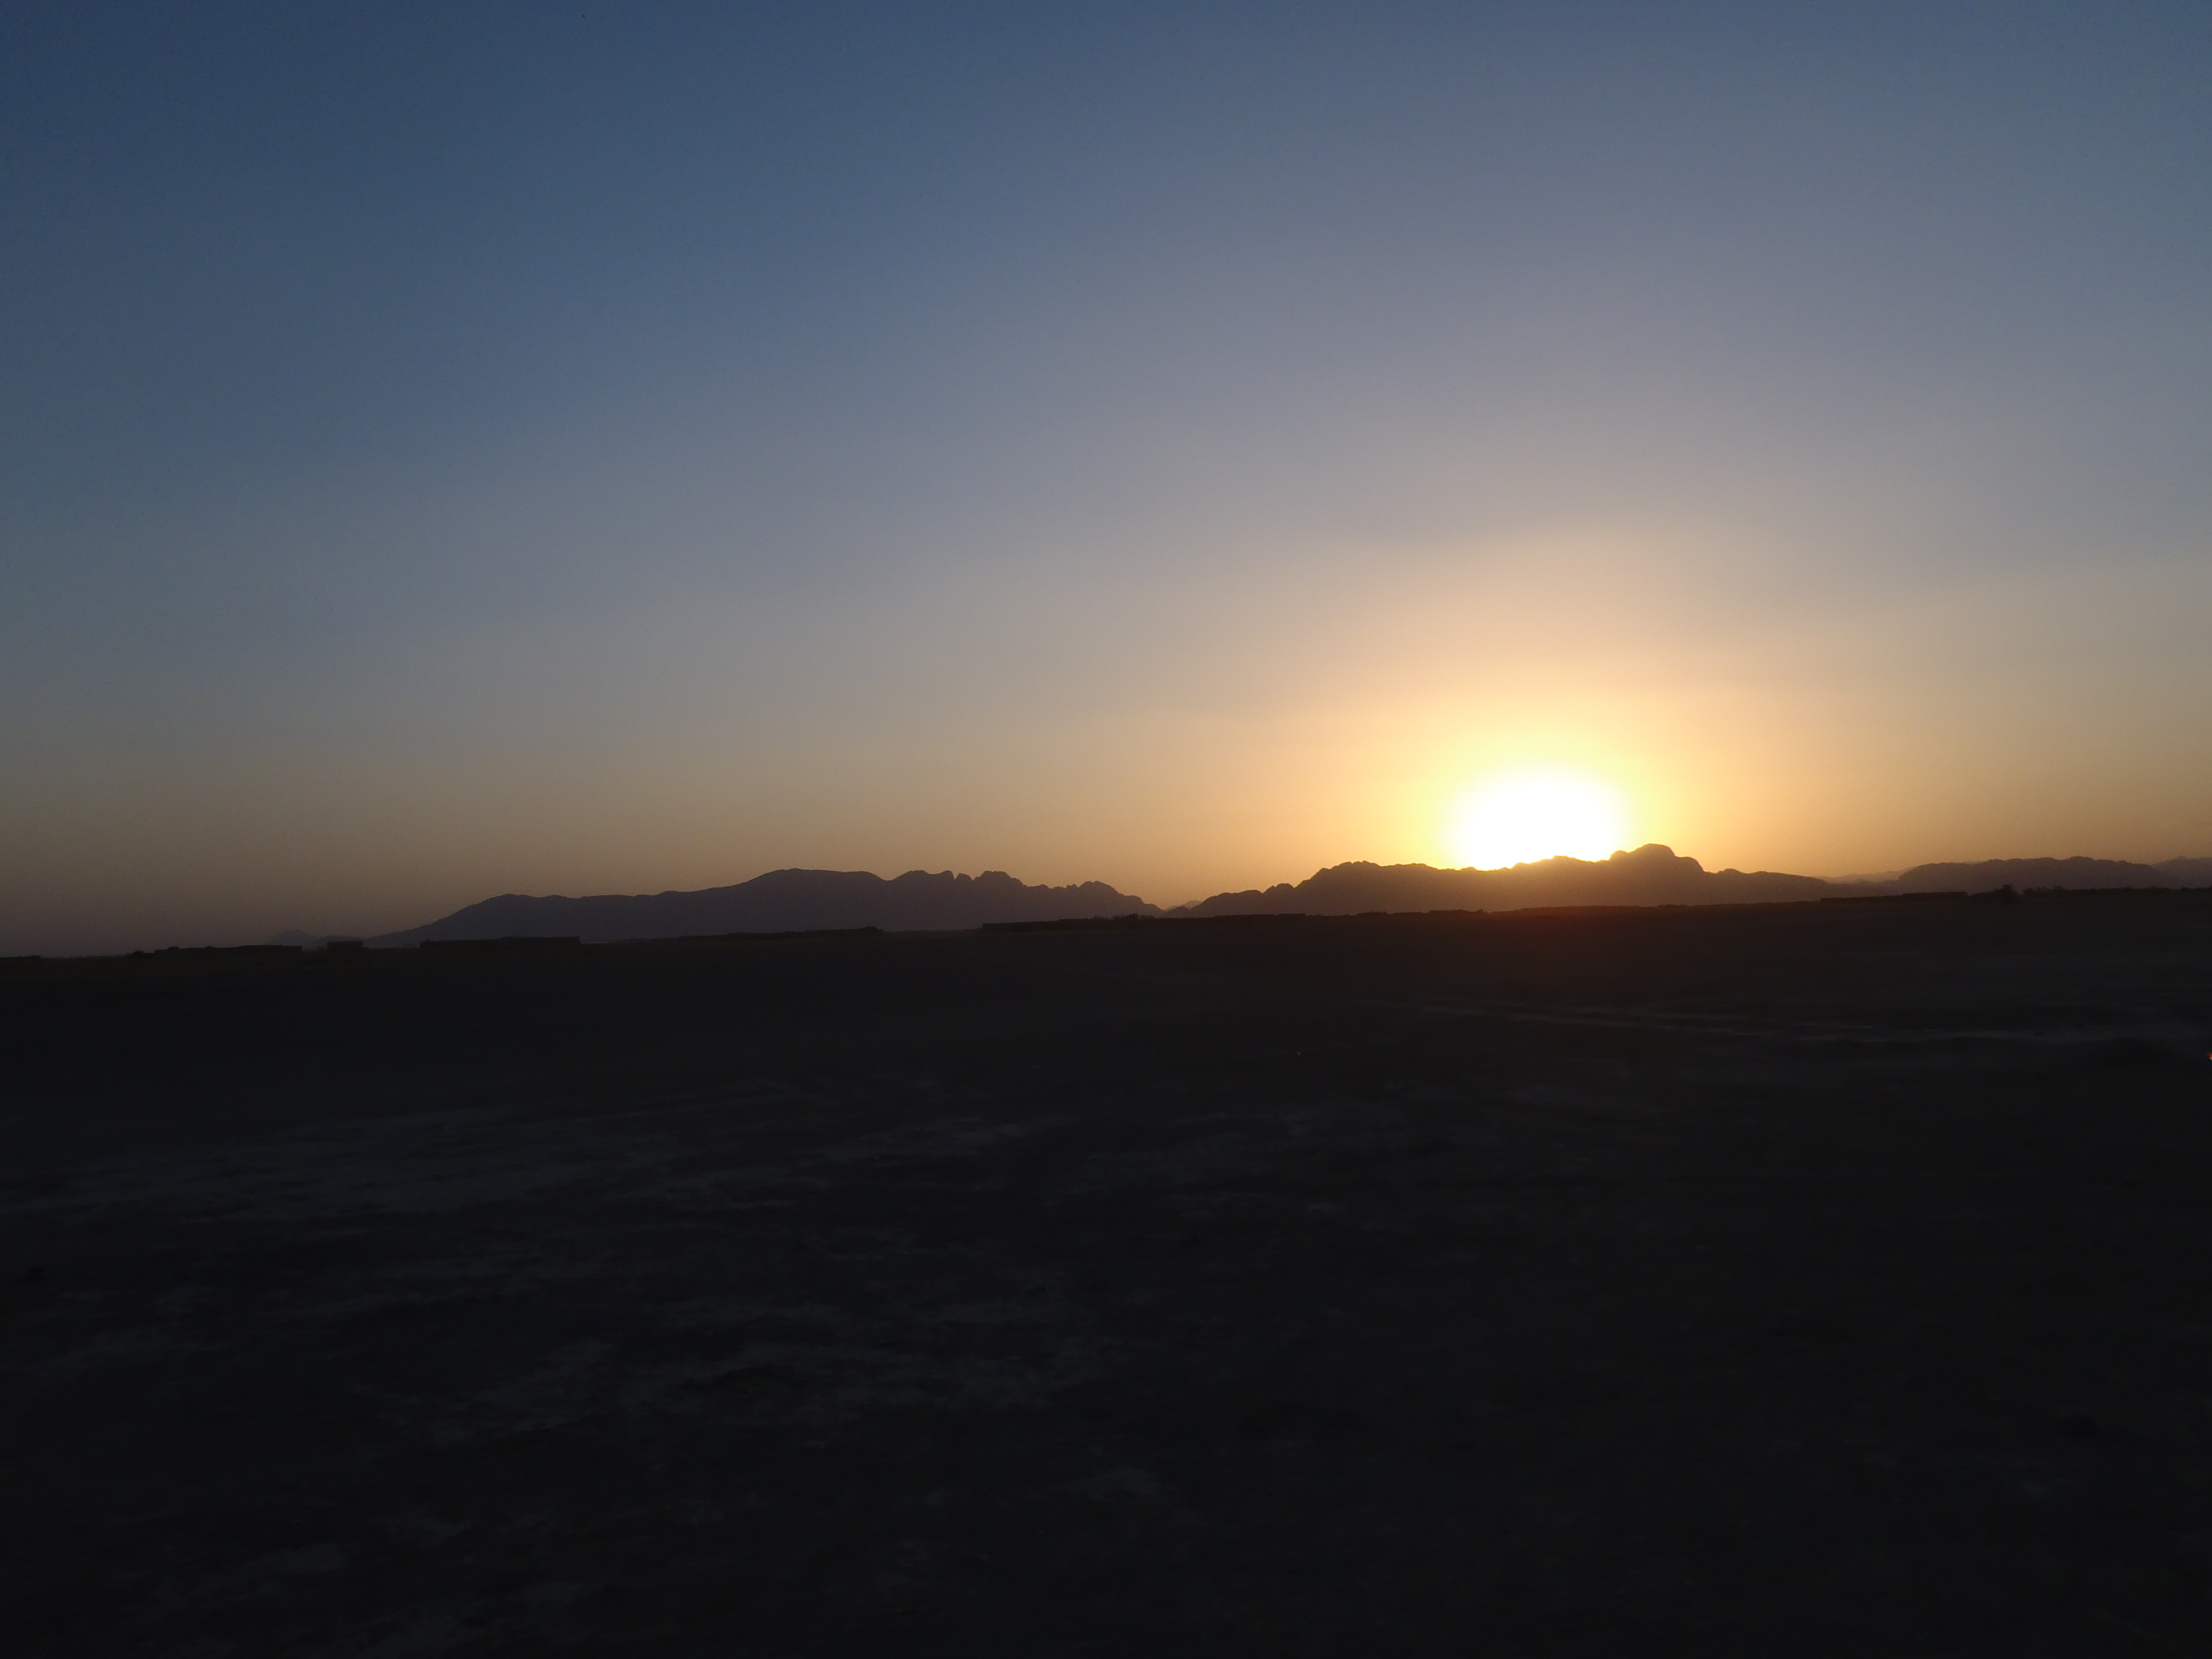 sunrise in Afghanistan